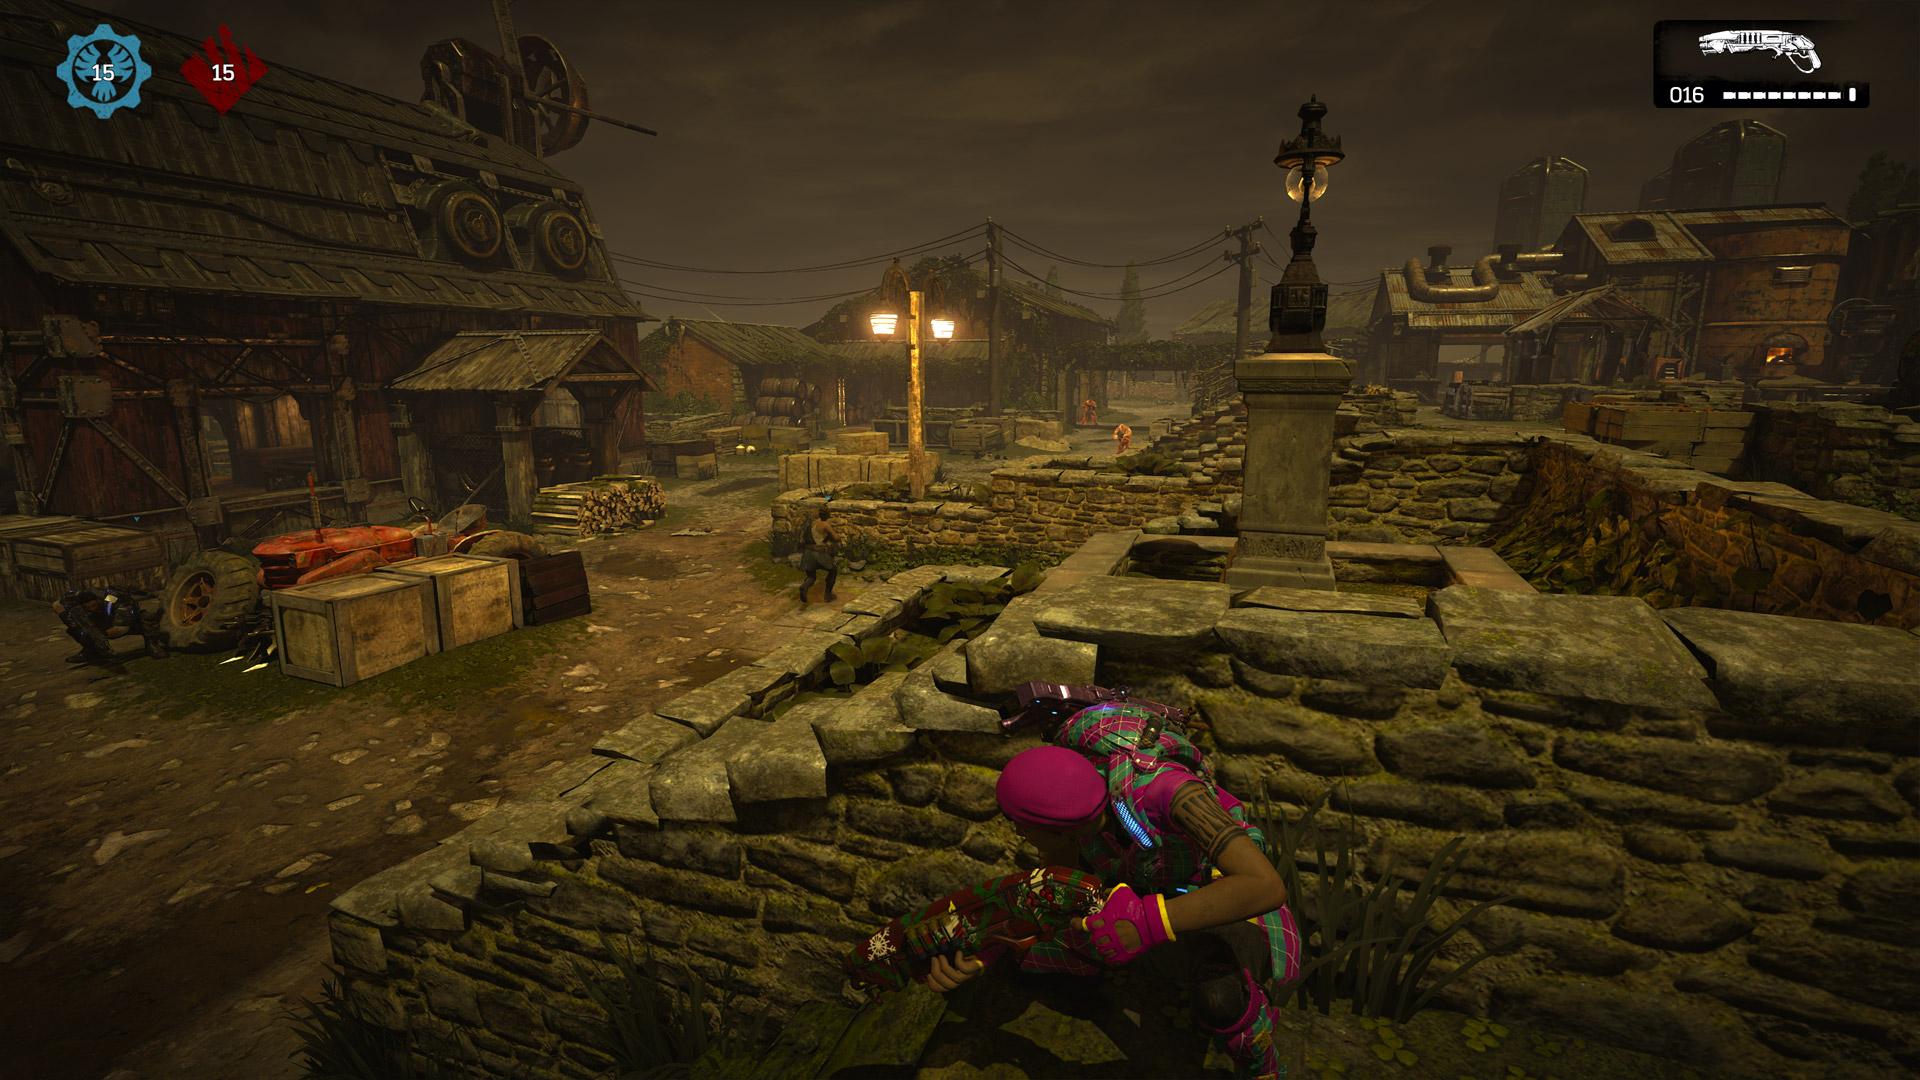 Gears of War 4 Xbox One X Screenshot Multiplayer